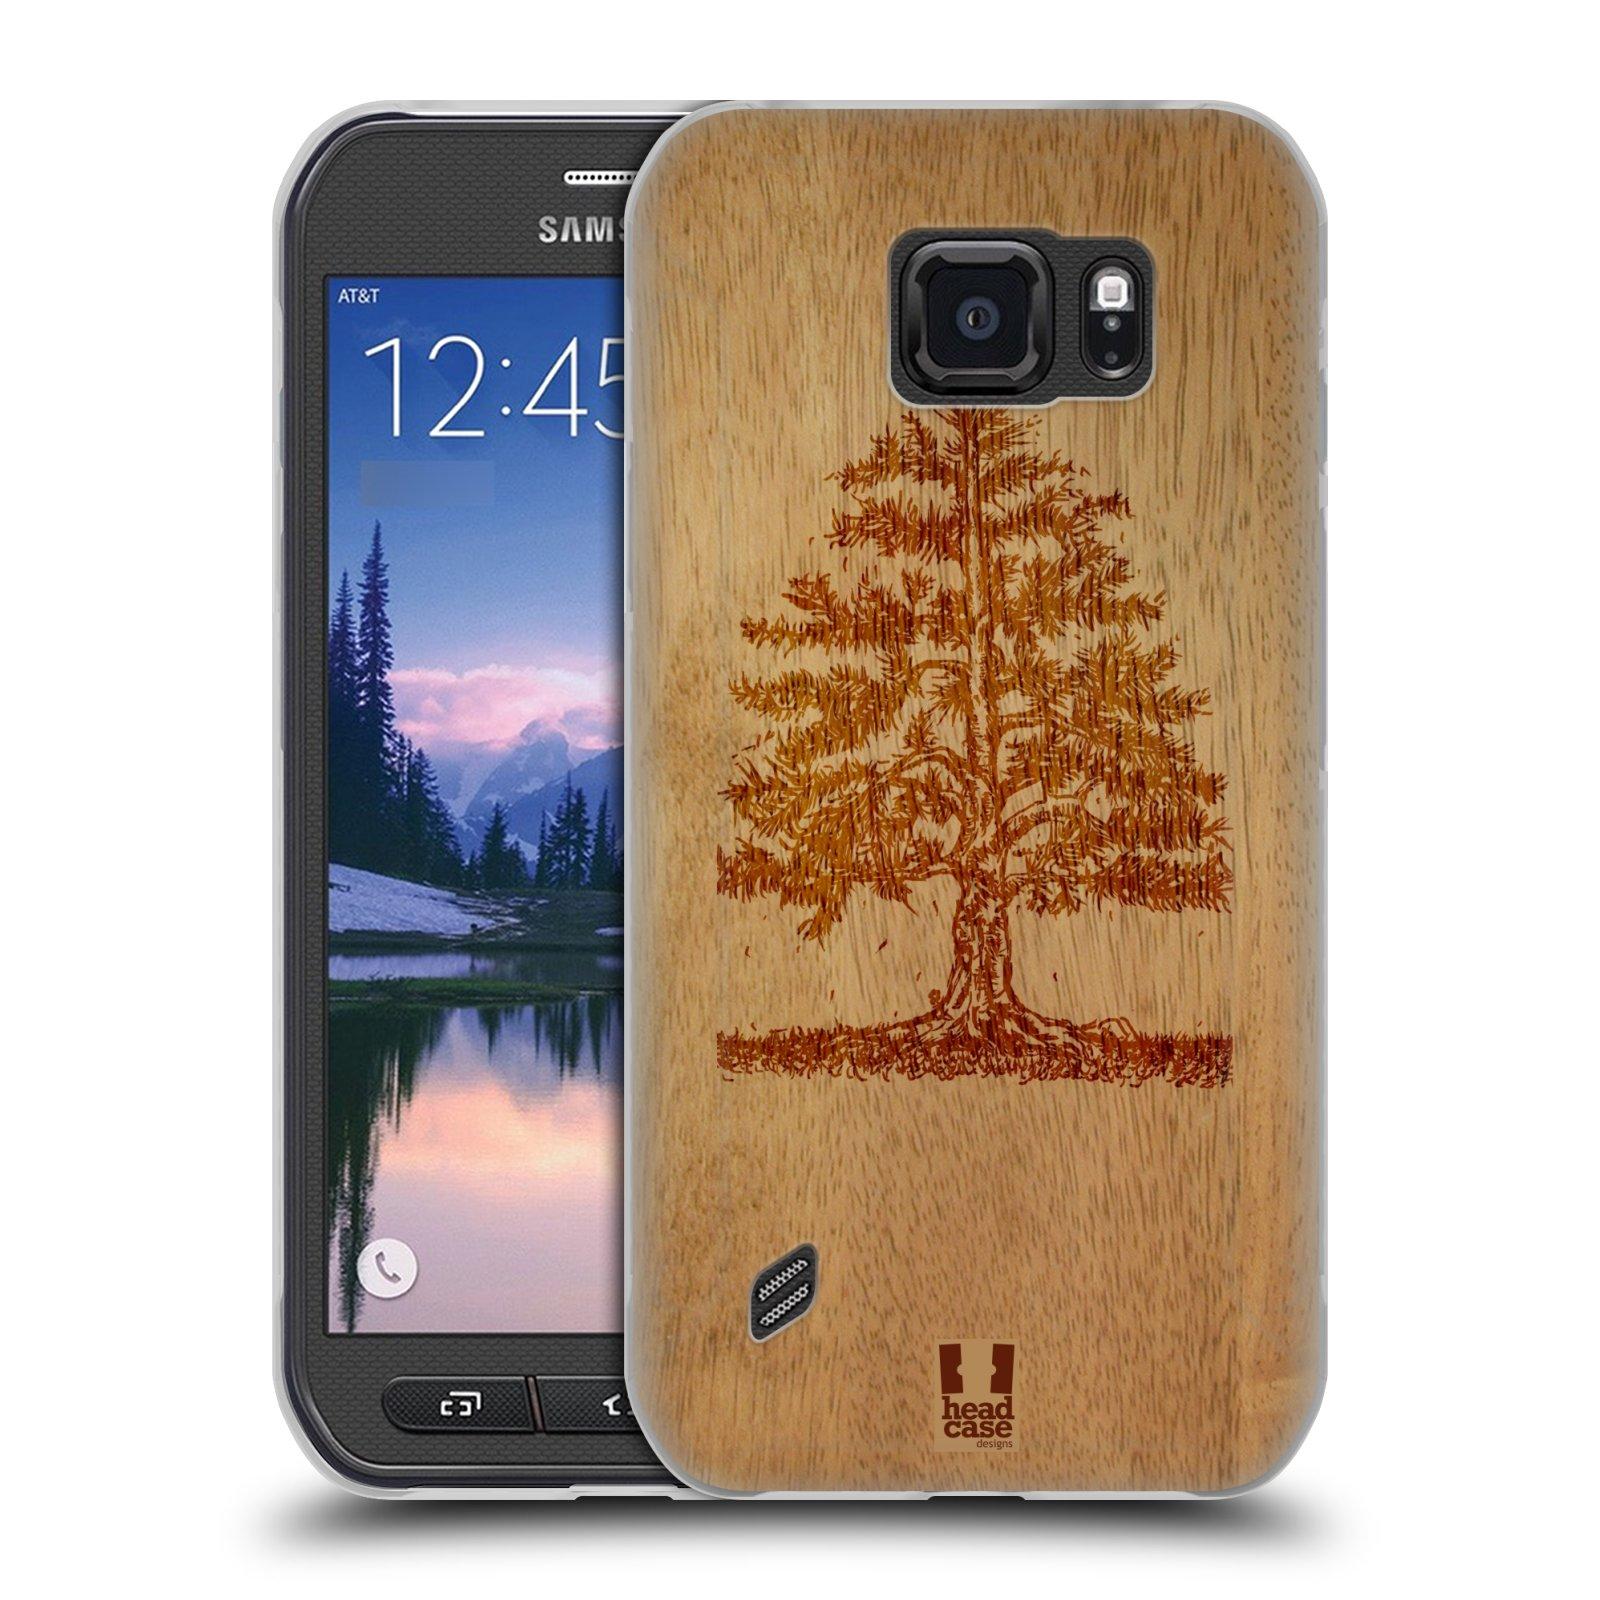 HEAD CASE silikonový obal na mobil Samsung Galaxy S6 ACTIVE vzor Dřevěné umění STROM